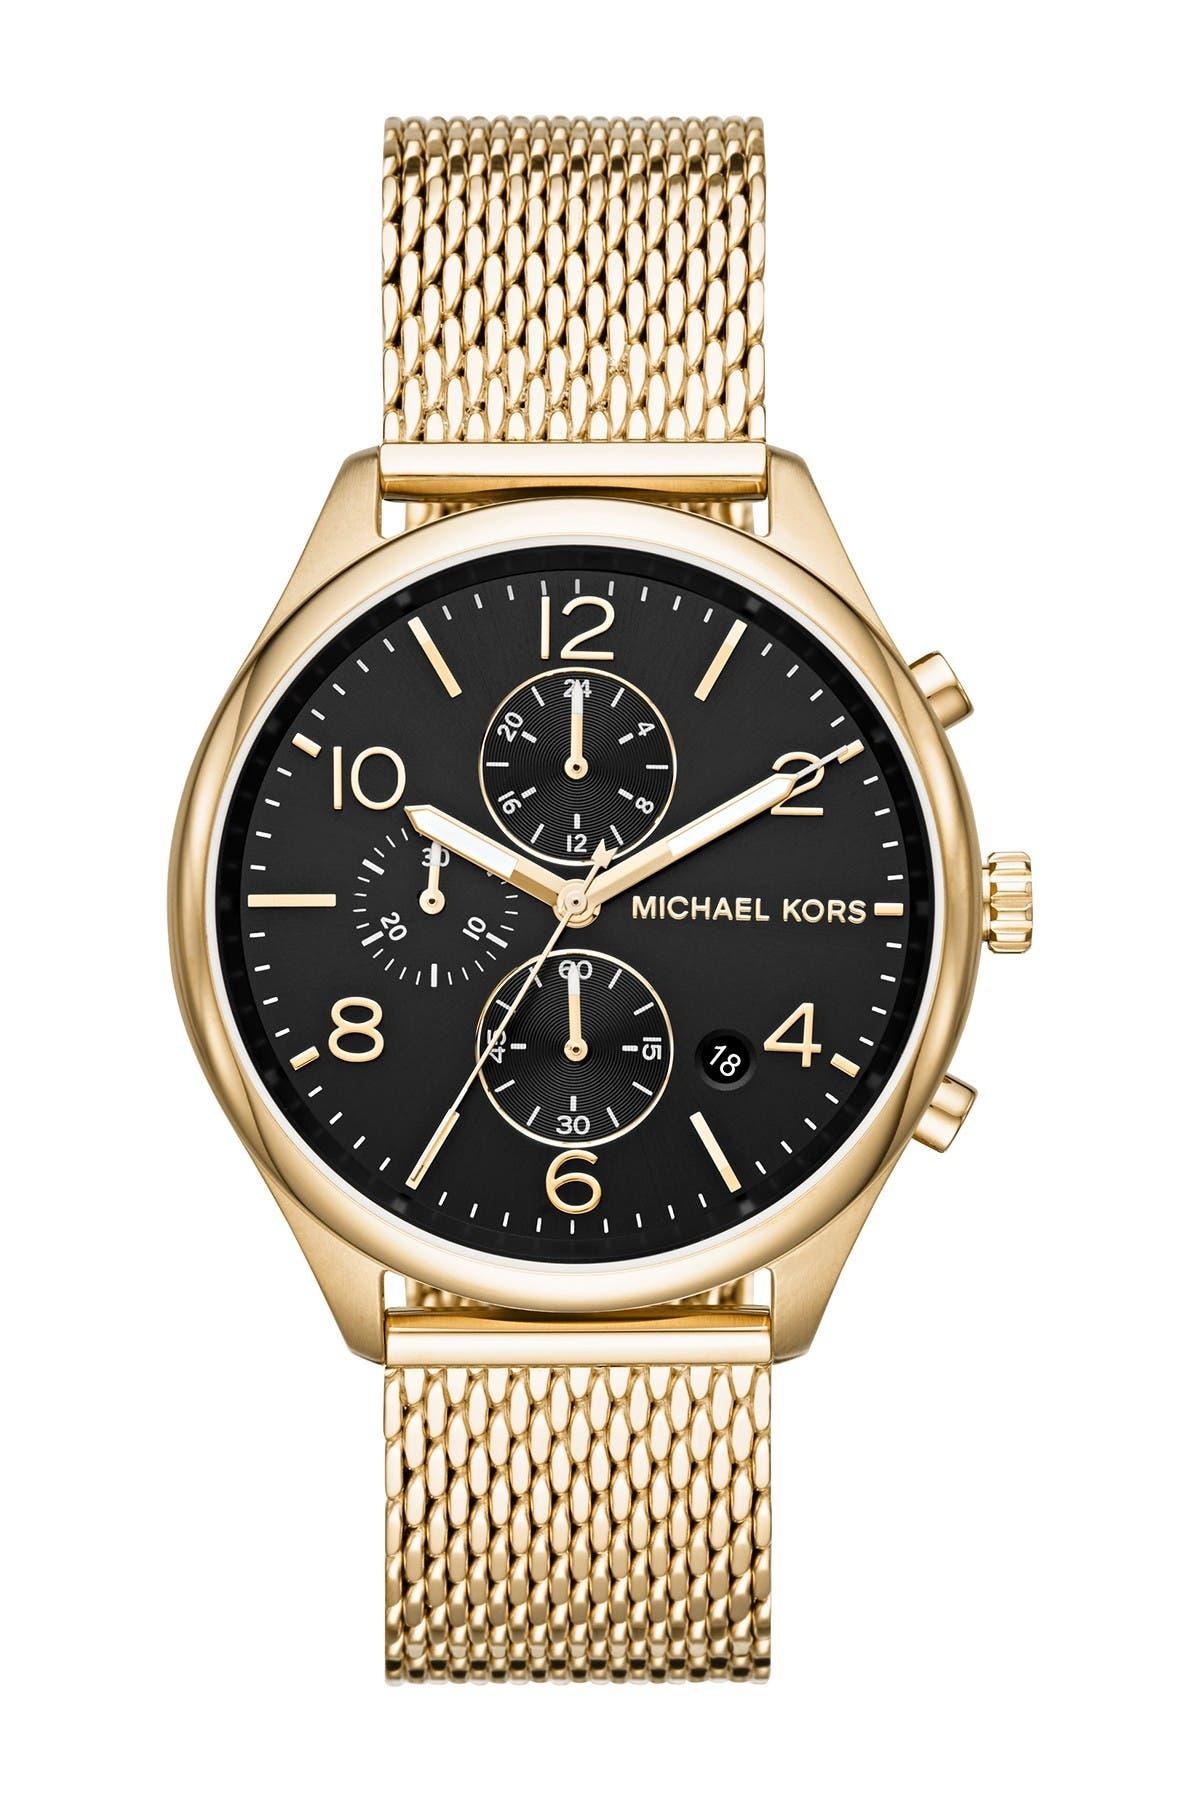 Image of Michael Kors Men's Merrick Chronograph Bracelet Watch, 42mm